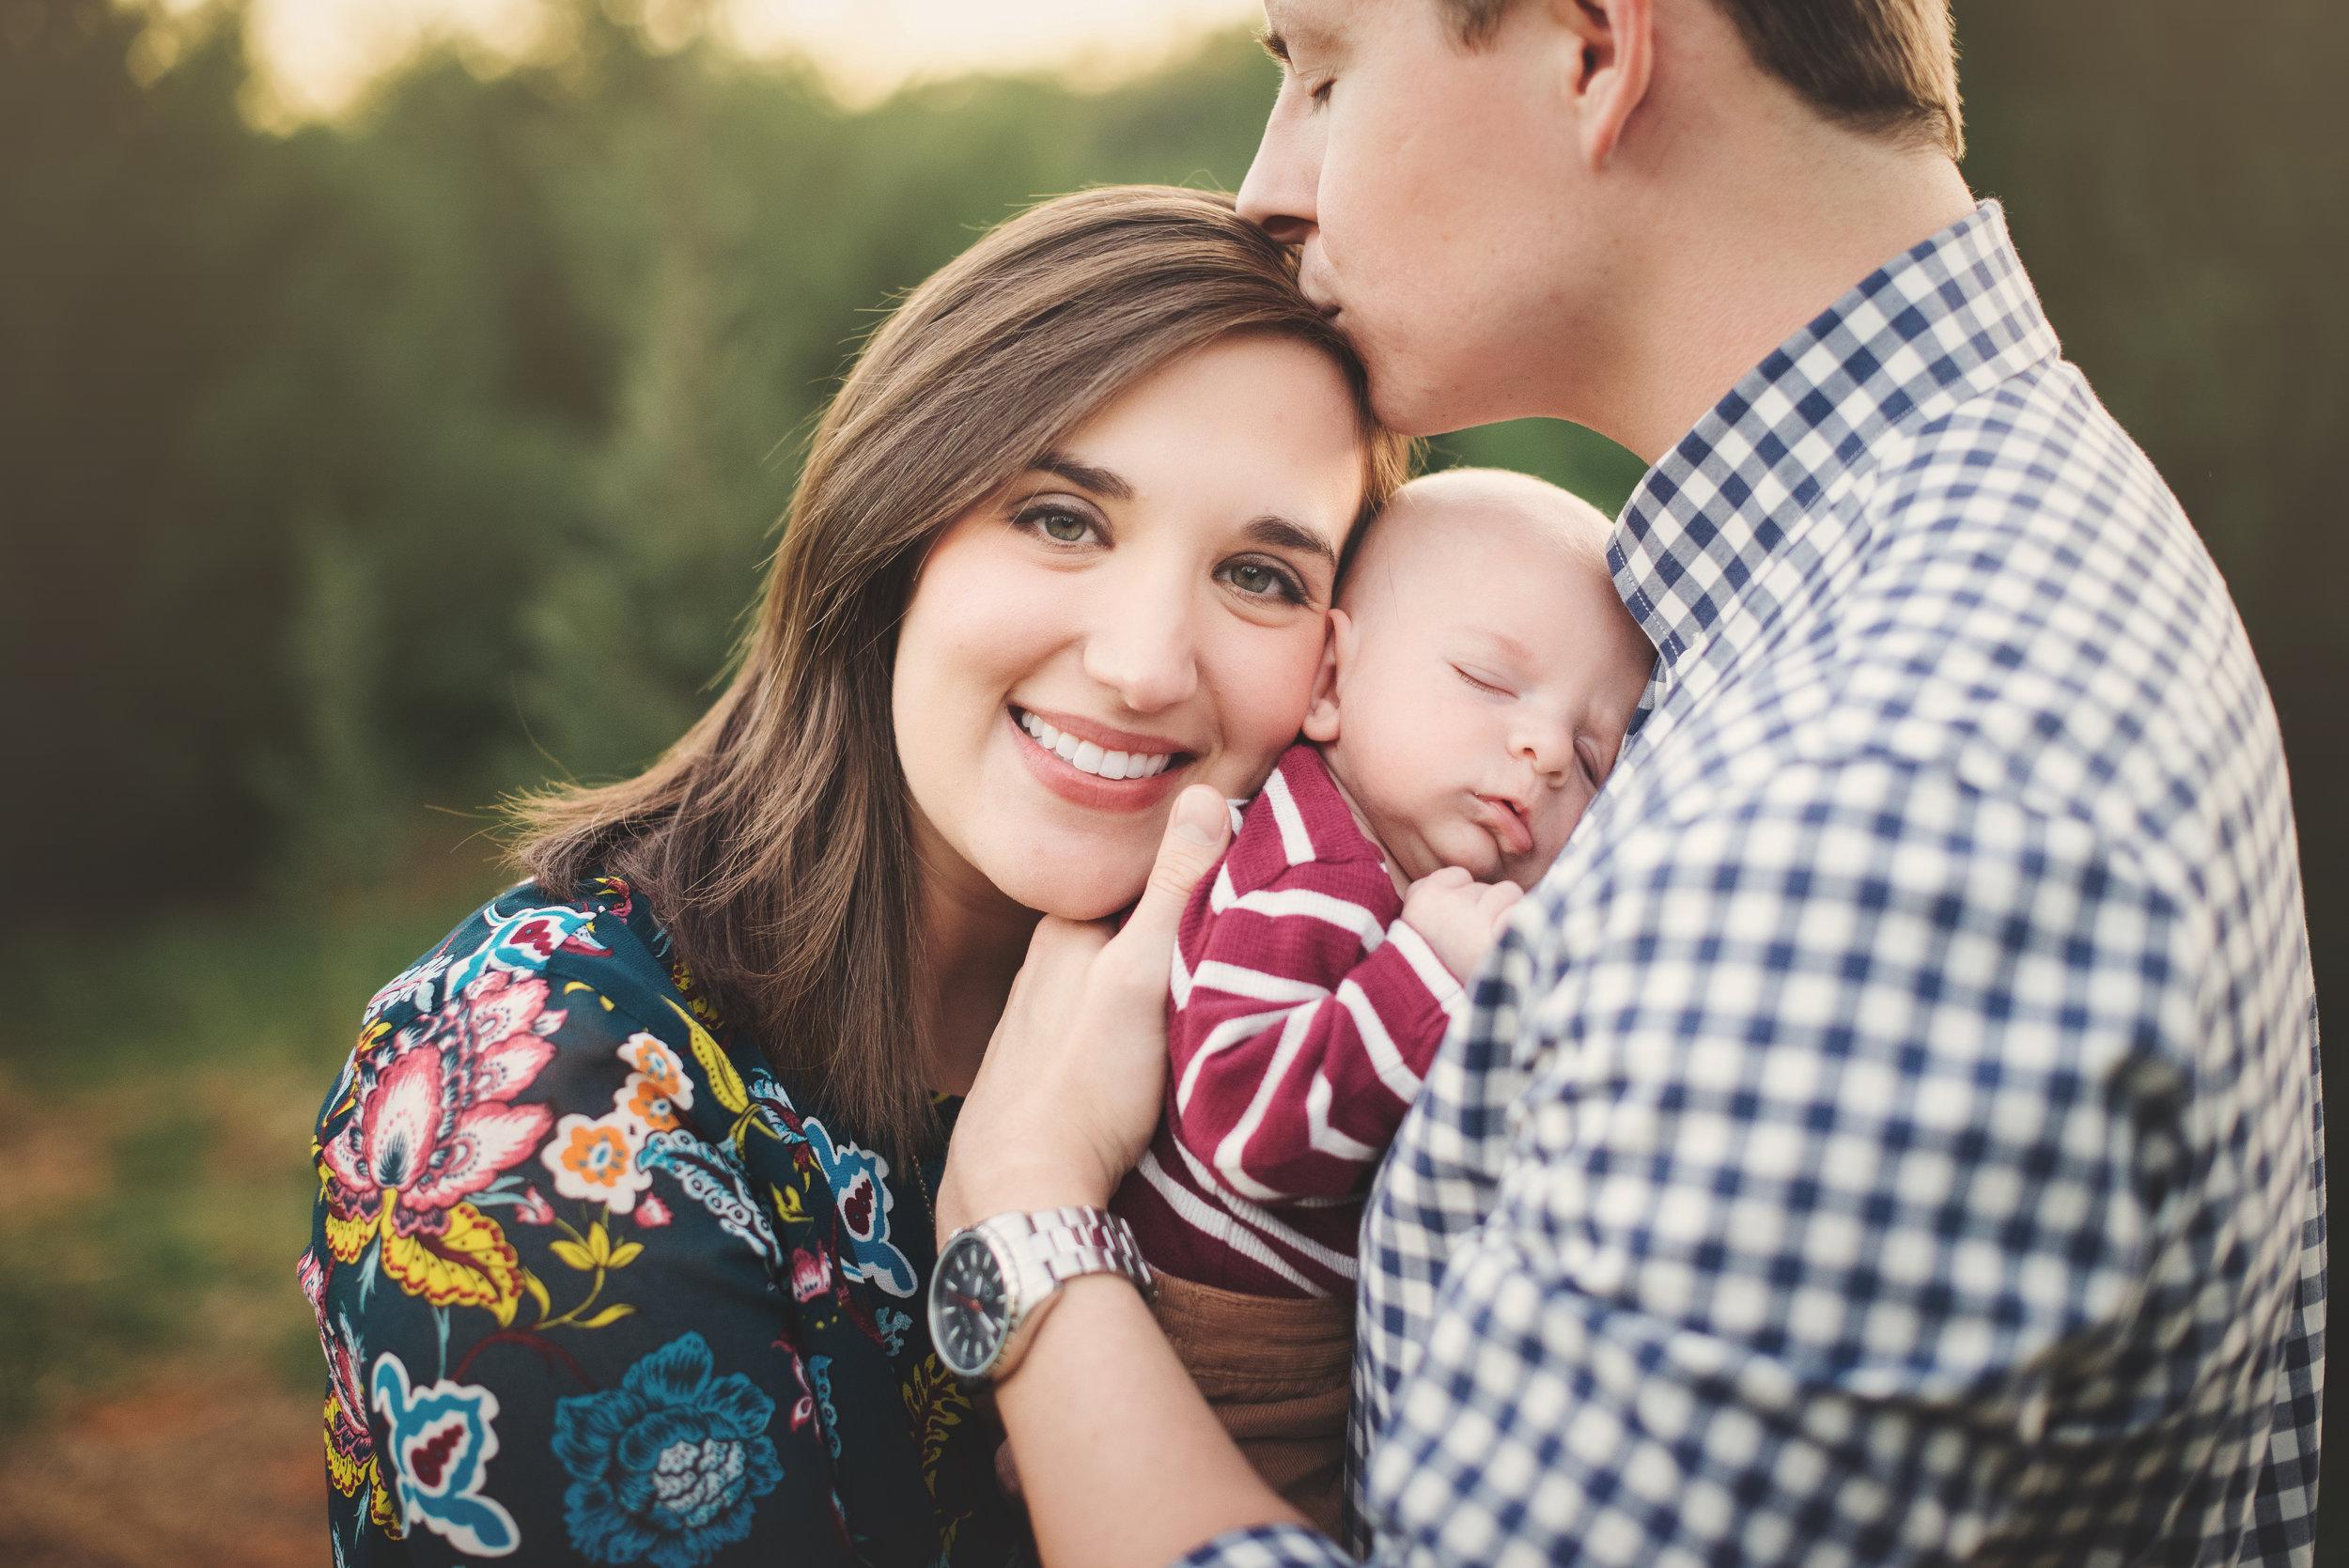 memphisfamilyphotographer-12-3.jpg